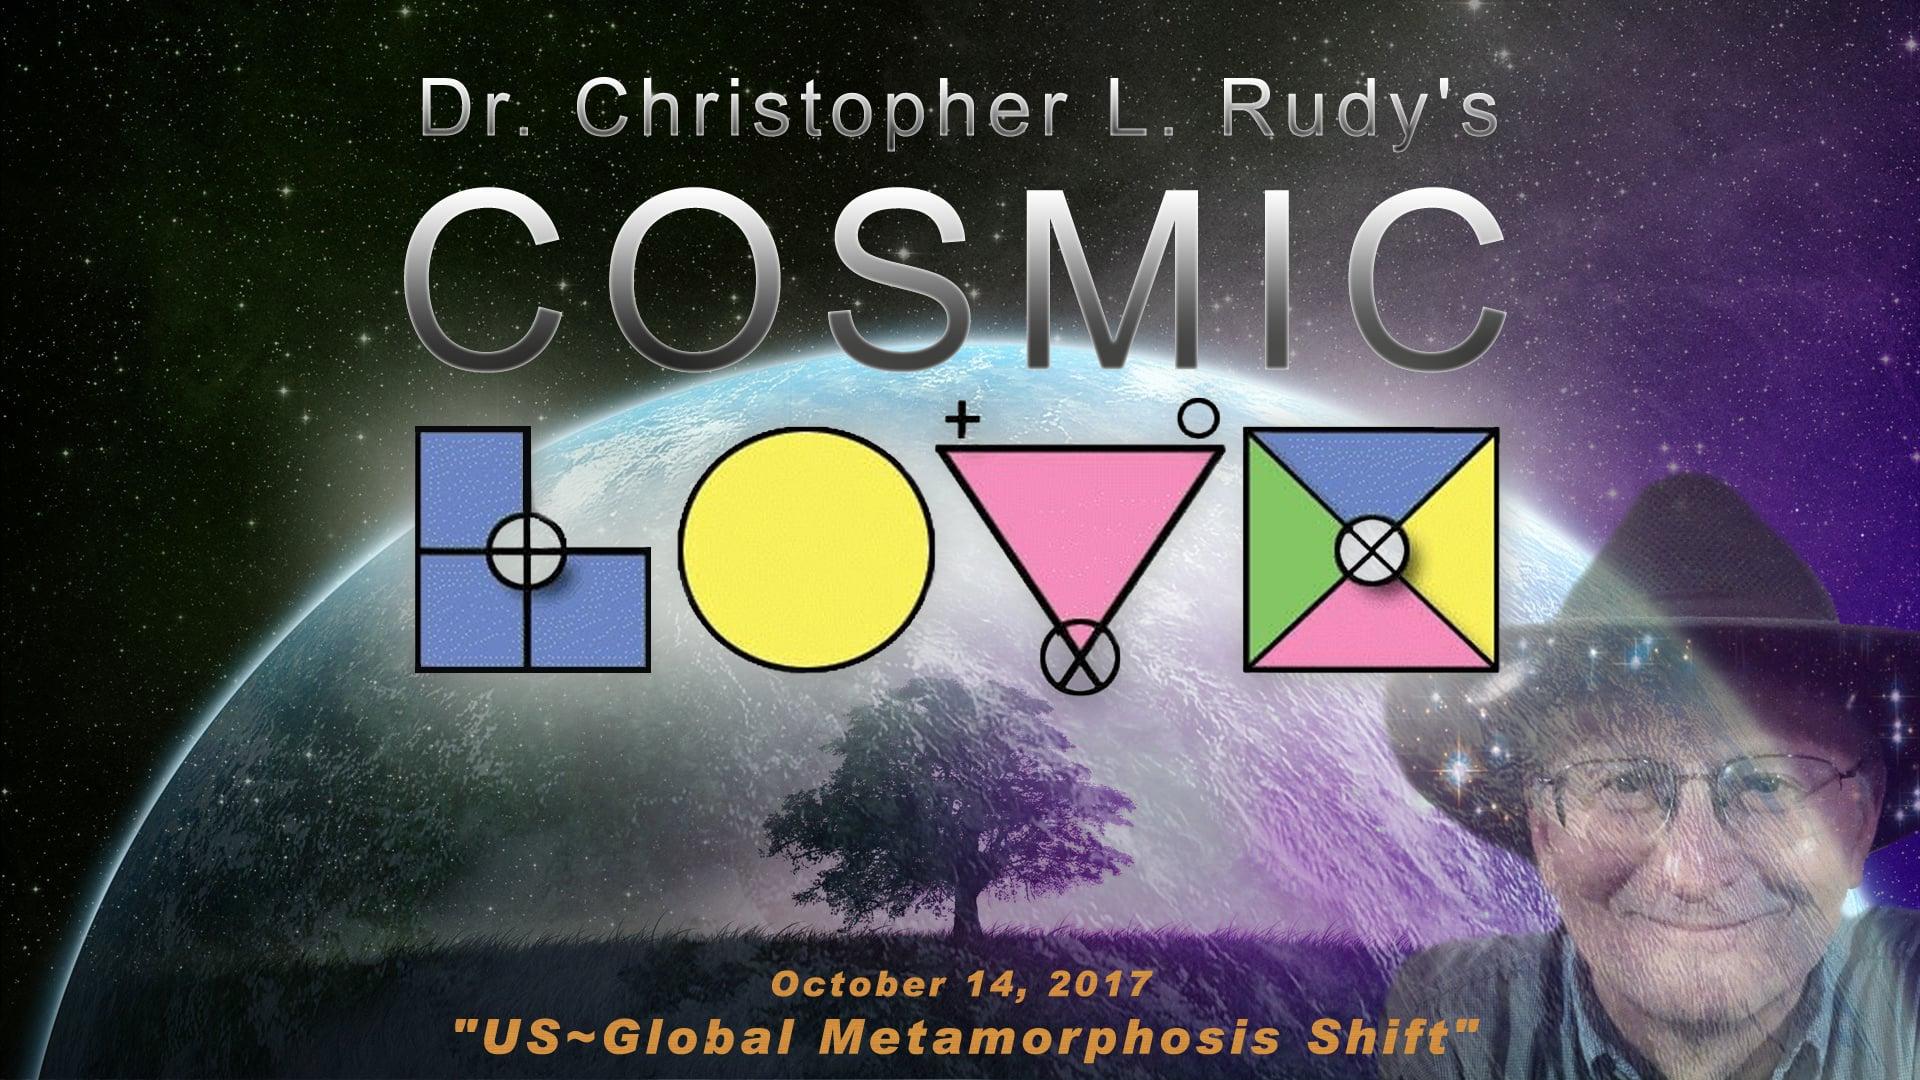 10-14-2017: US~Global Metamorphosis Shift